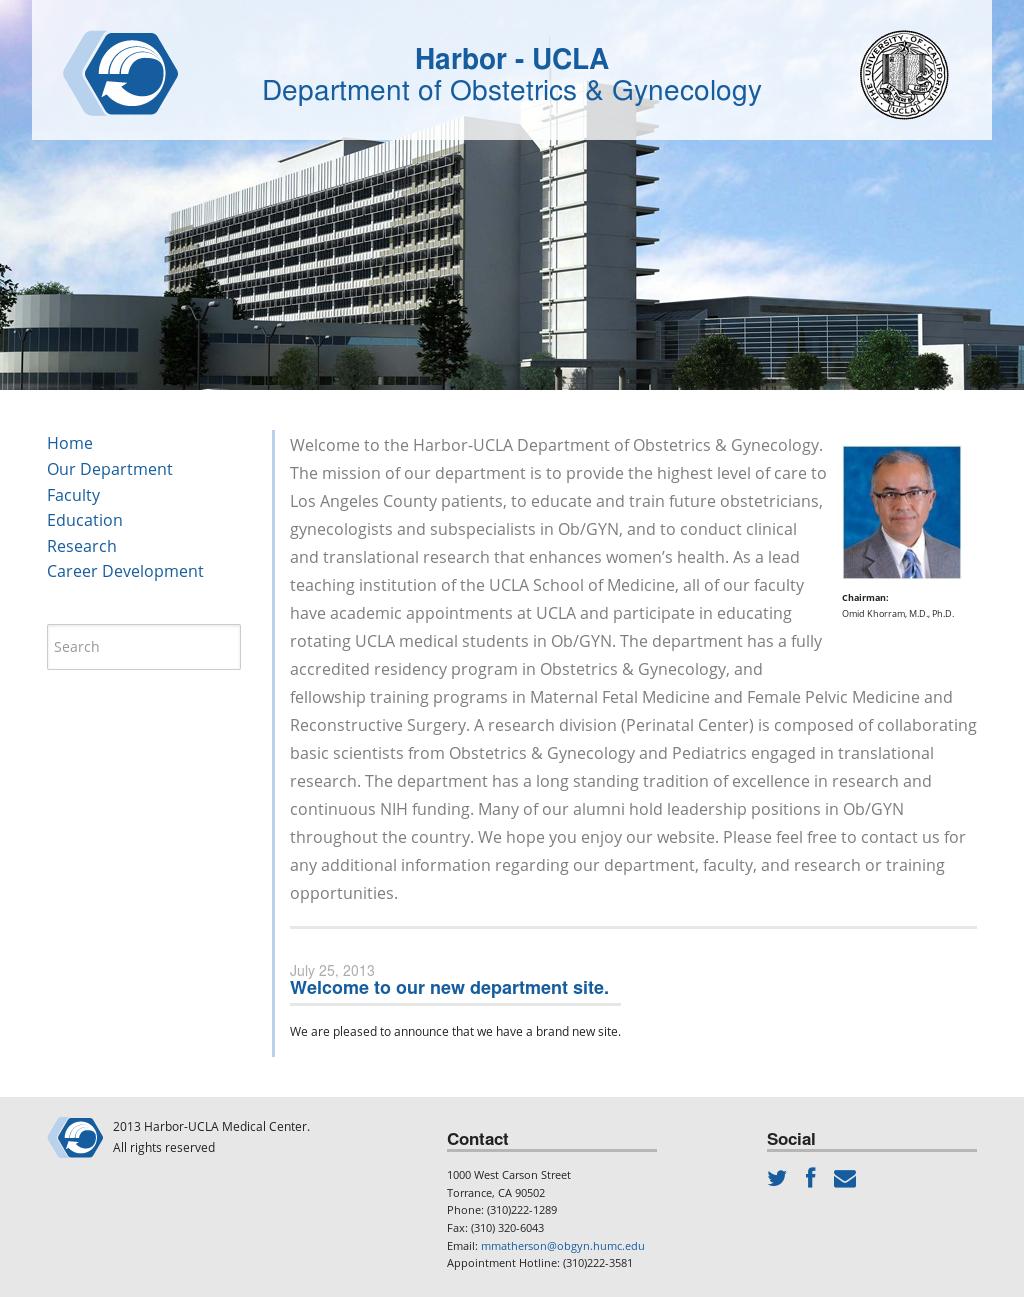 Harbor-ucla Department Of Obstetrics & Gynecology